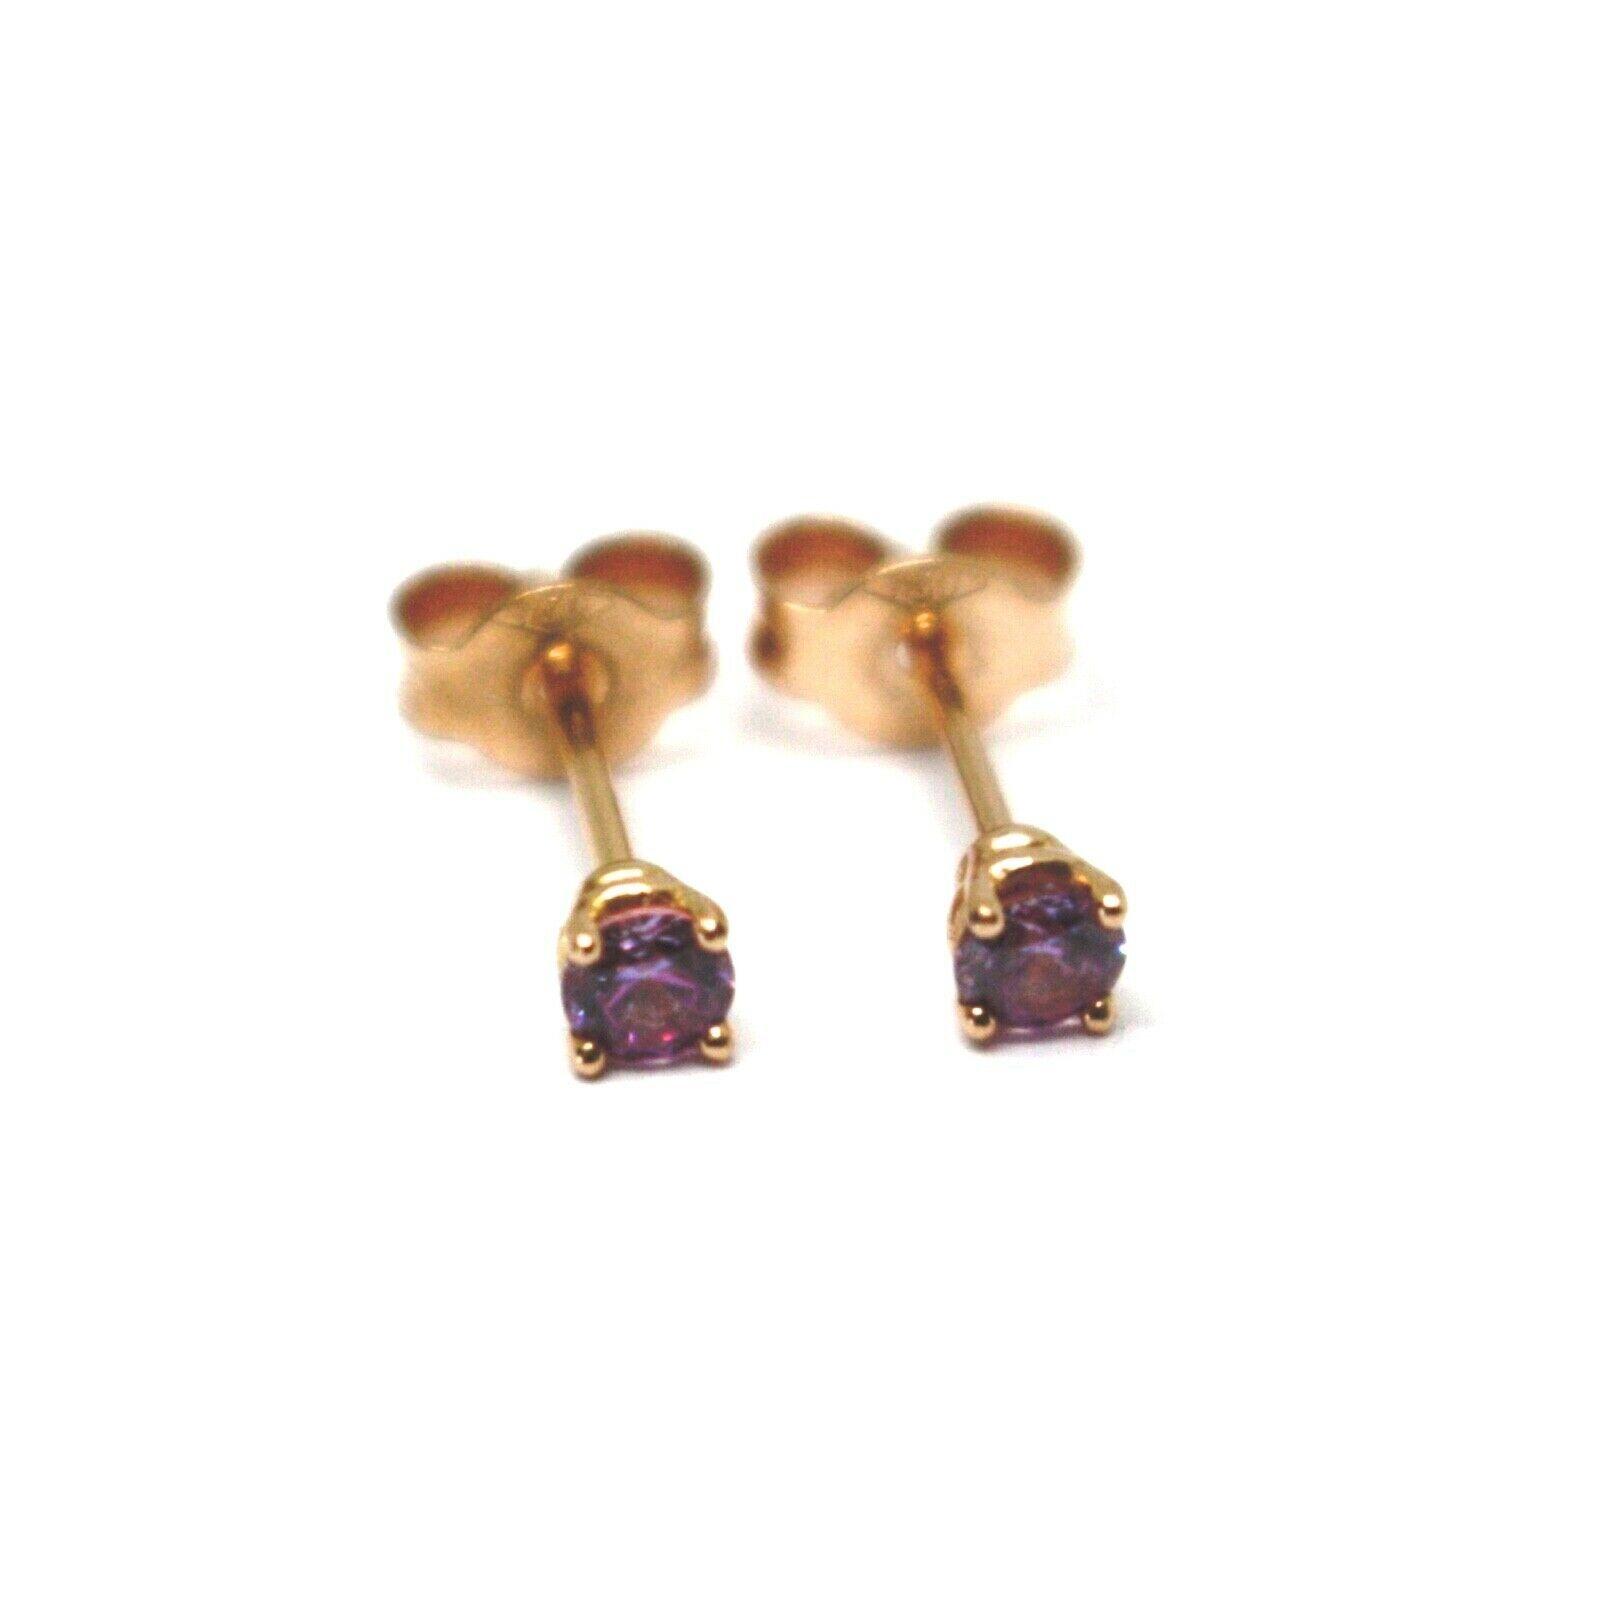 "18K ROSE GOLD MINI BUTTON EARRINGS PURPLE CUBIC ZIRCONIA, DIAMETER 3mm 0.12"""